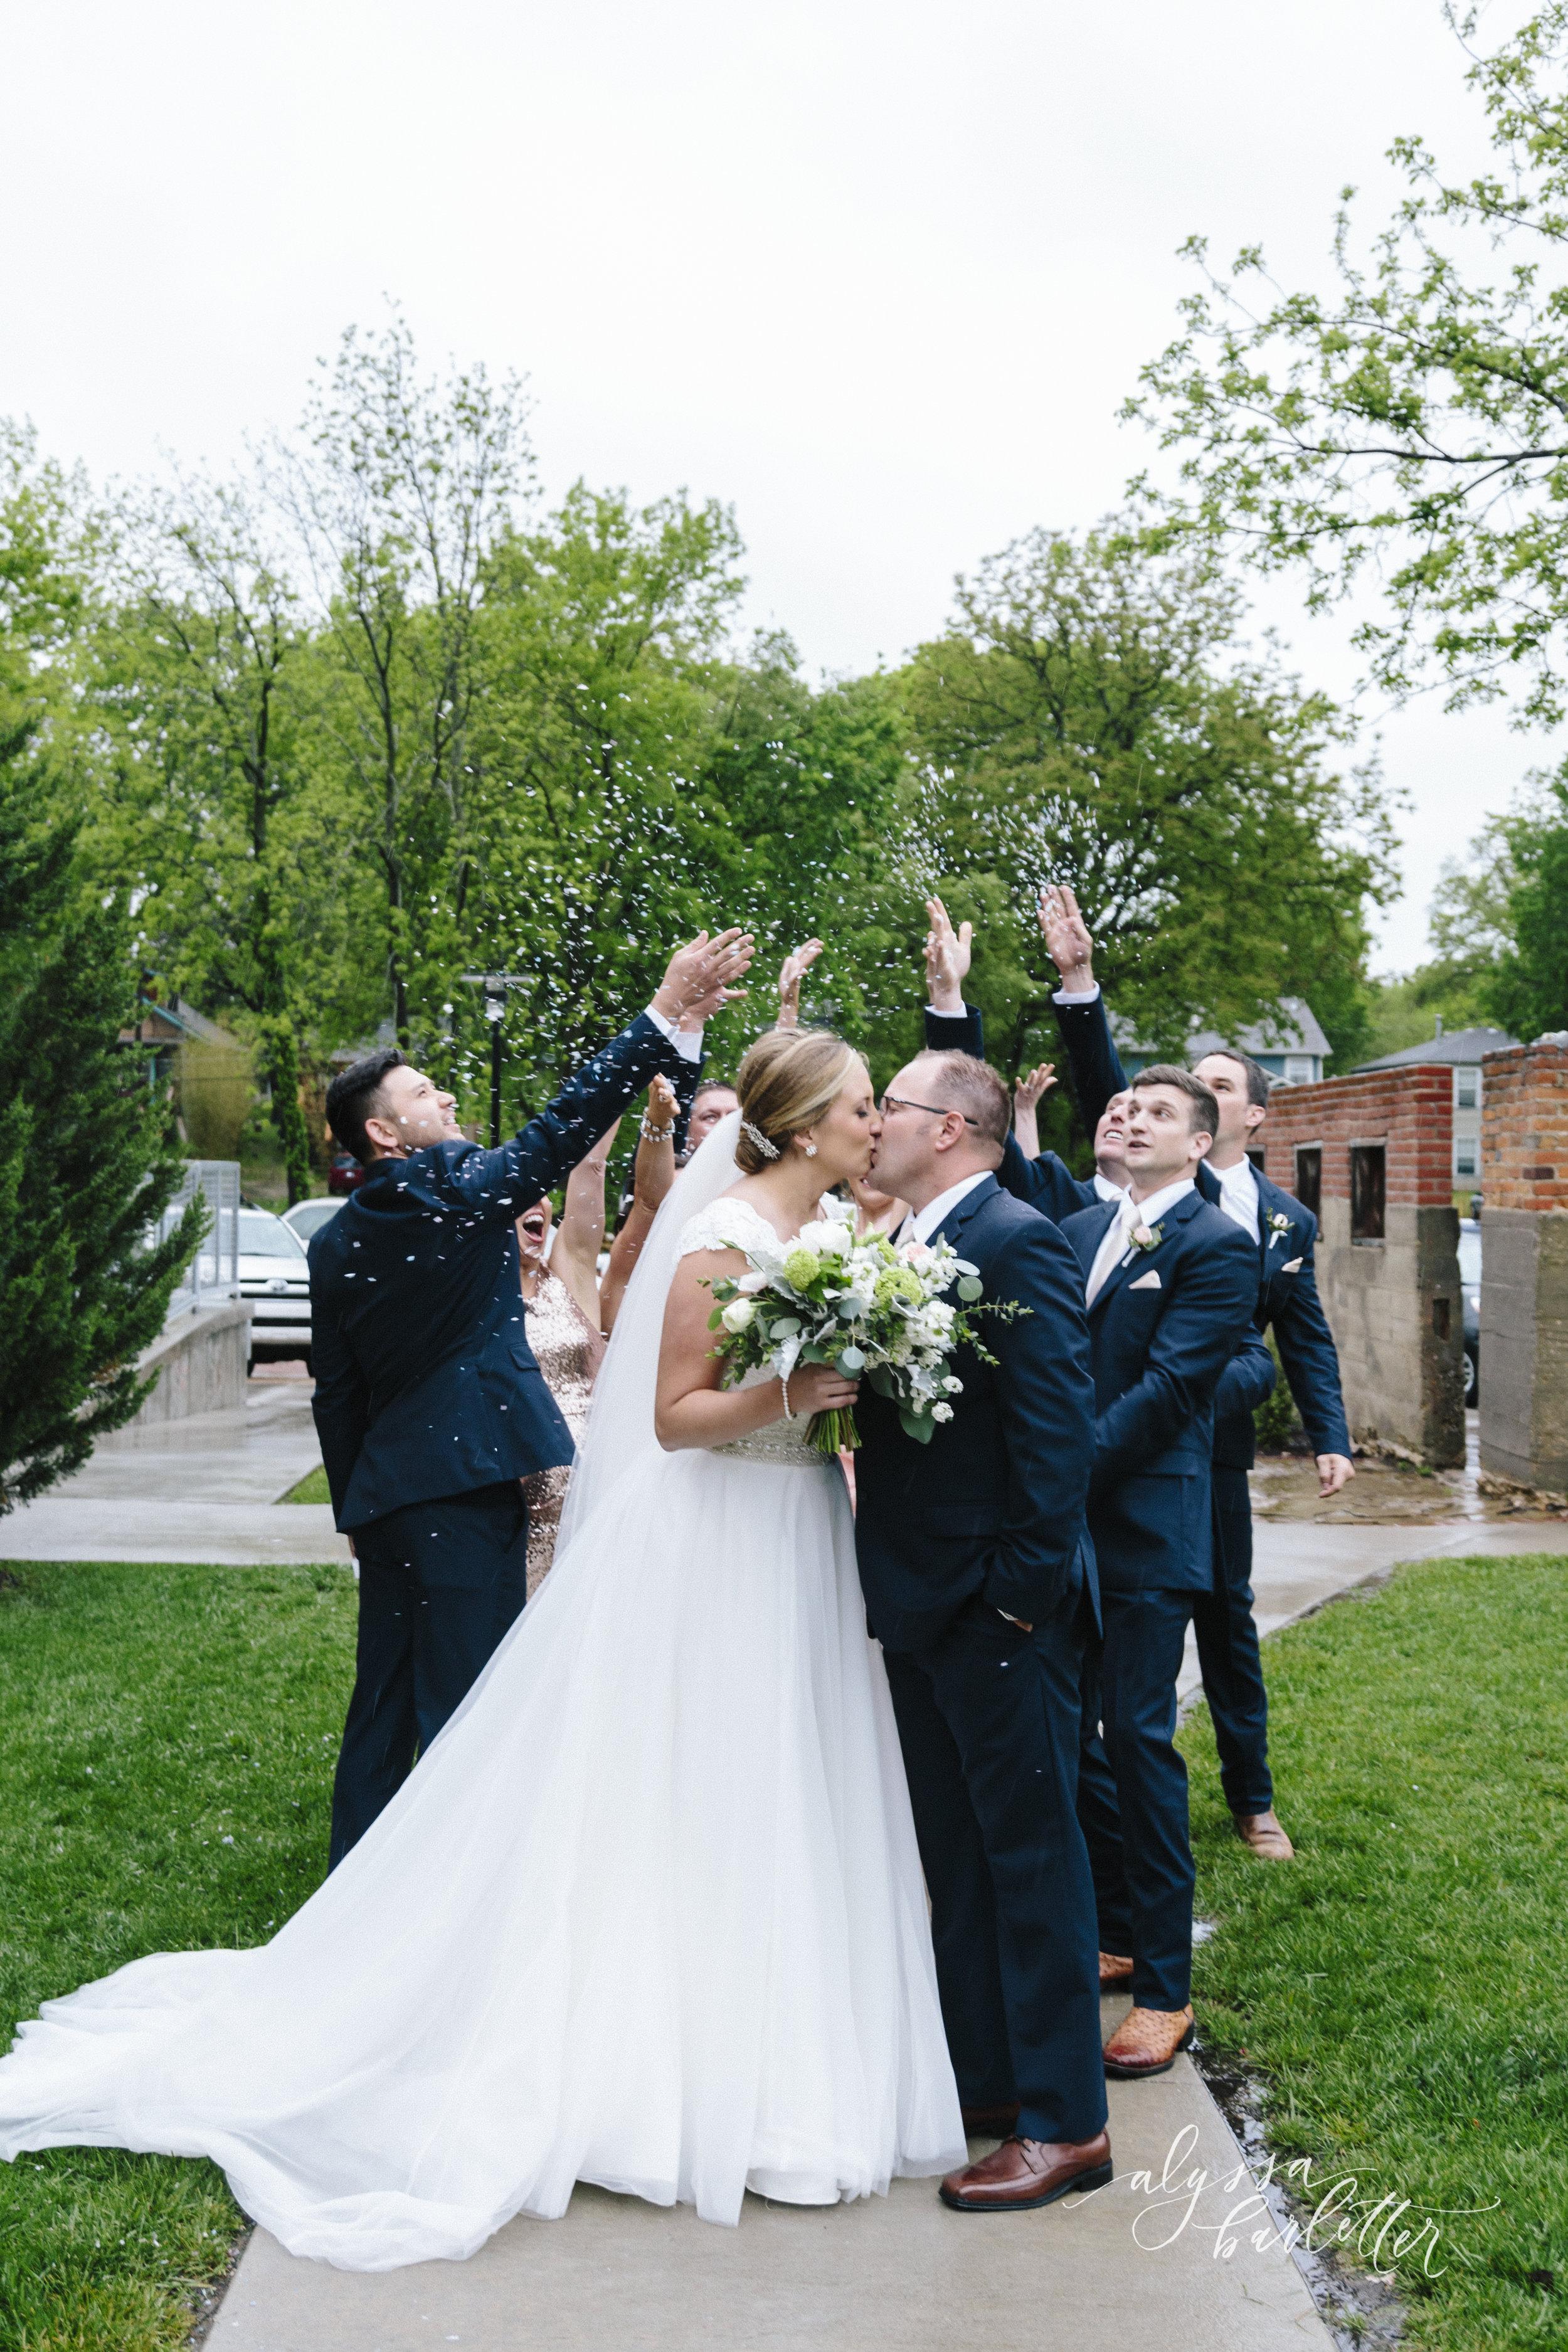 alyssa barletter photography cider gallery lawrence kansas rainy day wedding megan and brett-1-42.jpg